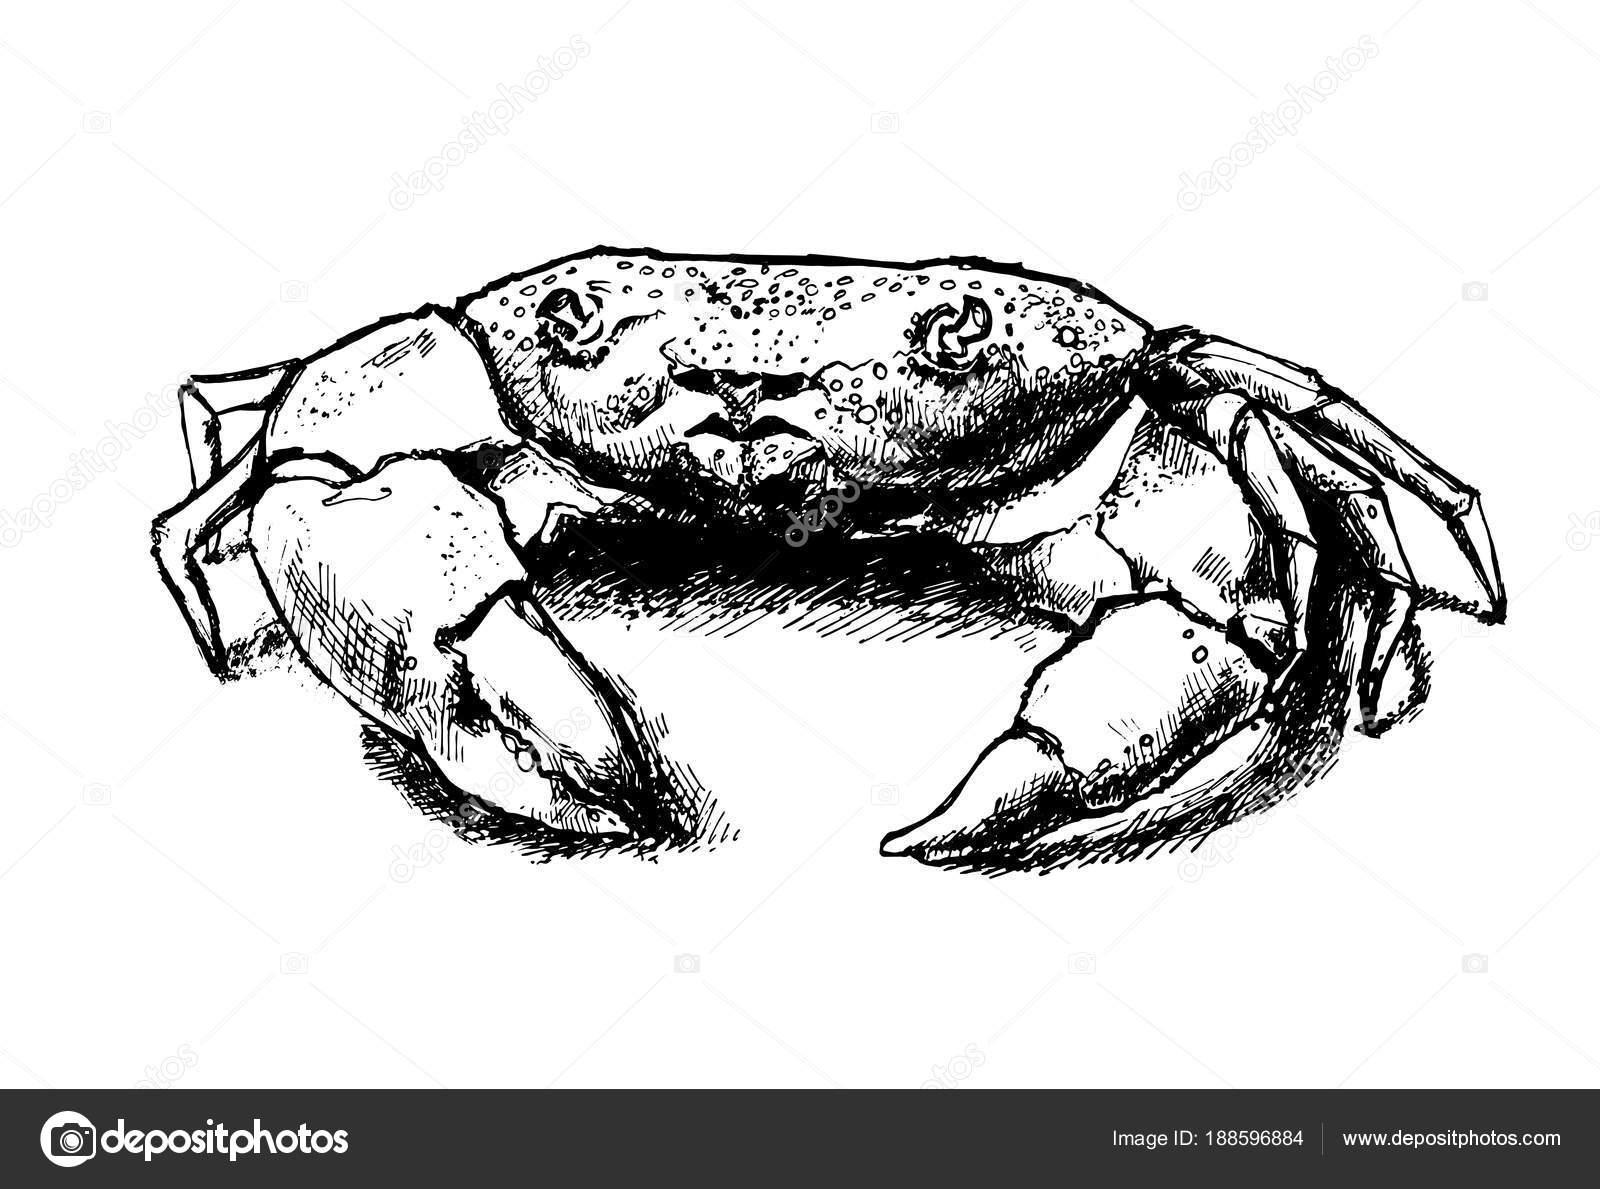 Crab Drawing Hand Drawn Vintage Graphic Illustration Marine Creature ...